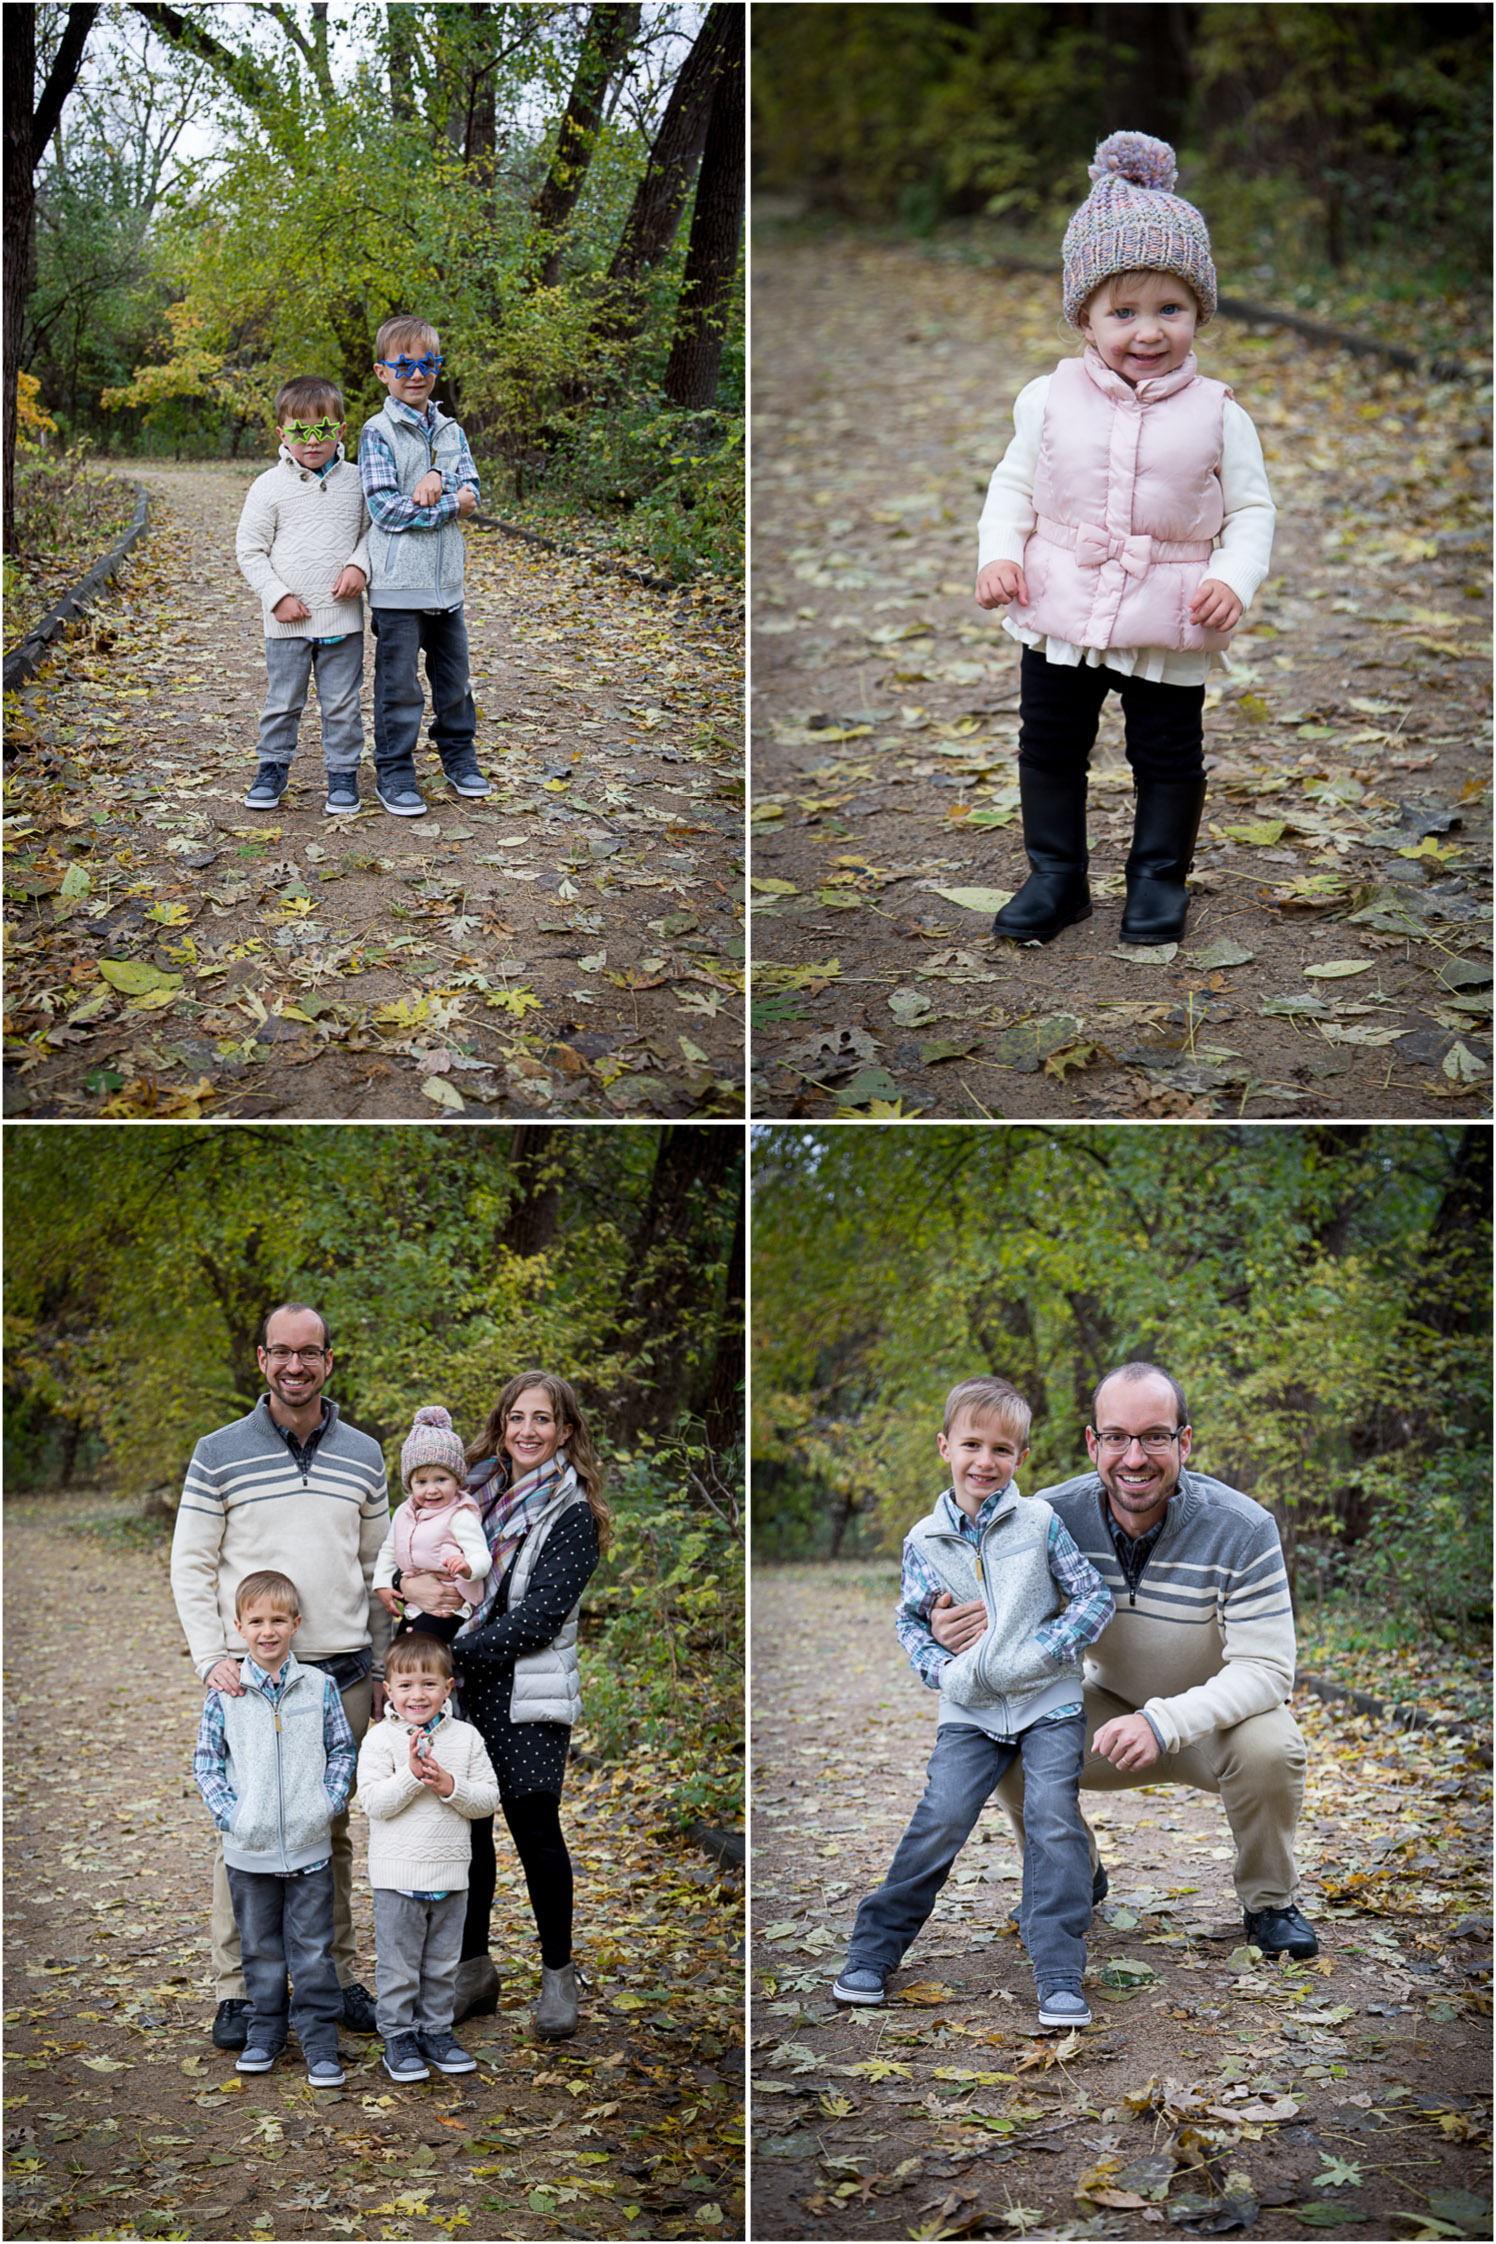 01-fall-family-session-hiking-trail-mahonen-photography.jpg